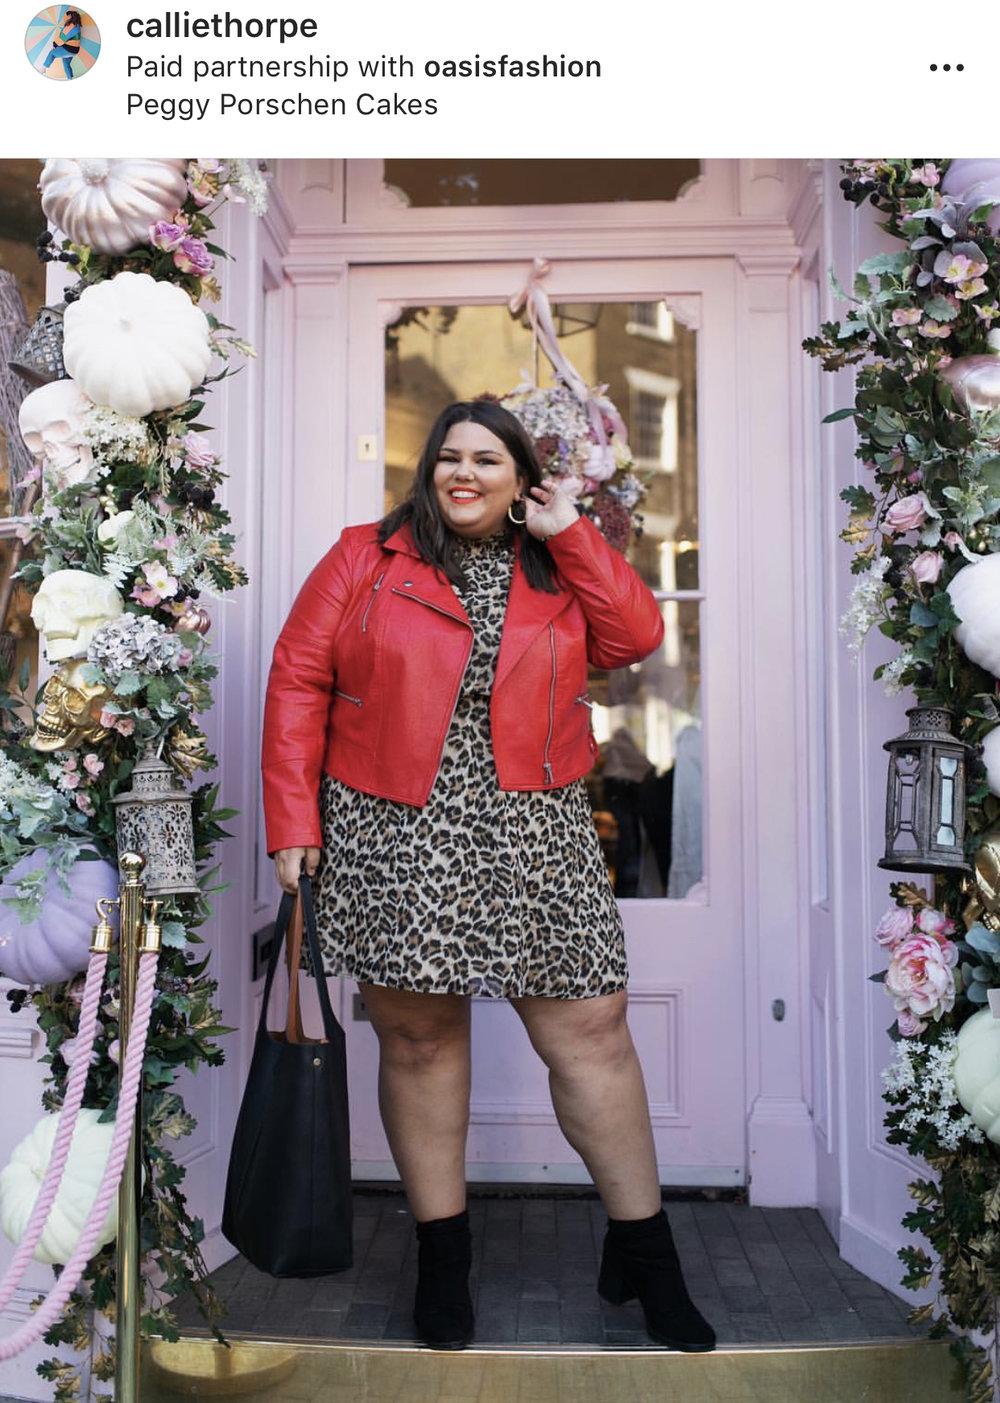 Callie Thorpe, self love, #Bopo, body positivity, plus size fashion, insta mum, mother pukka, Freddie harrel